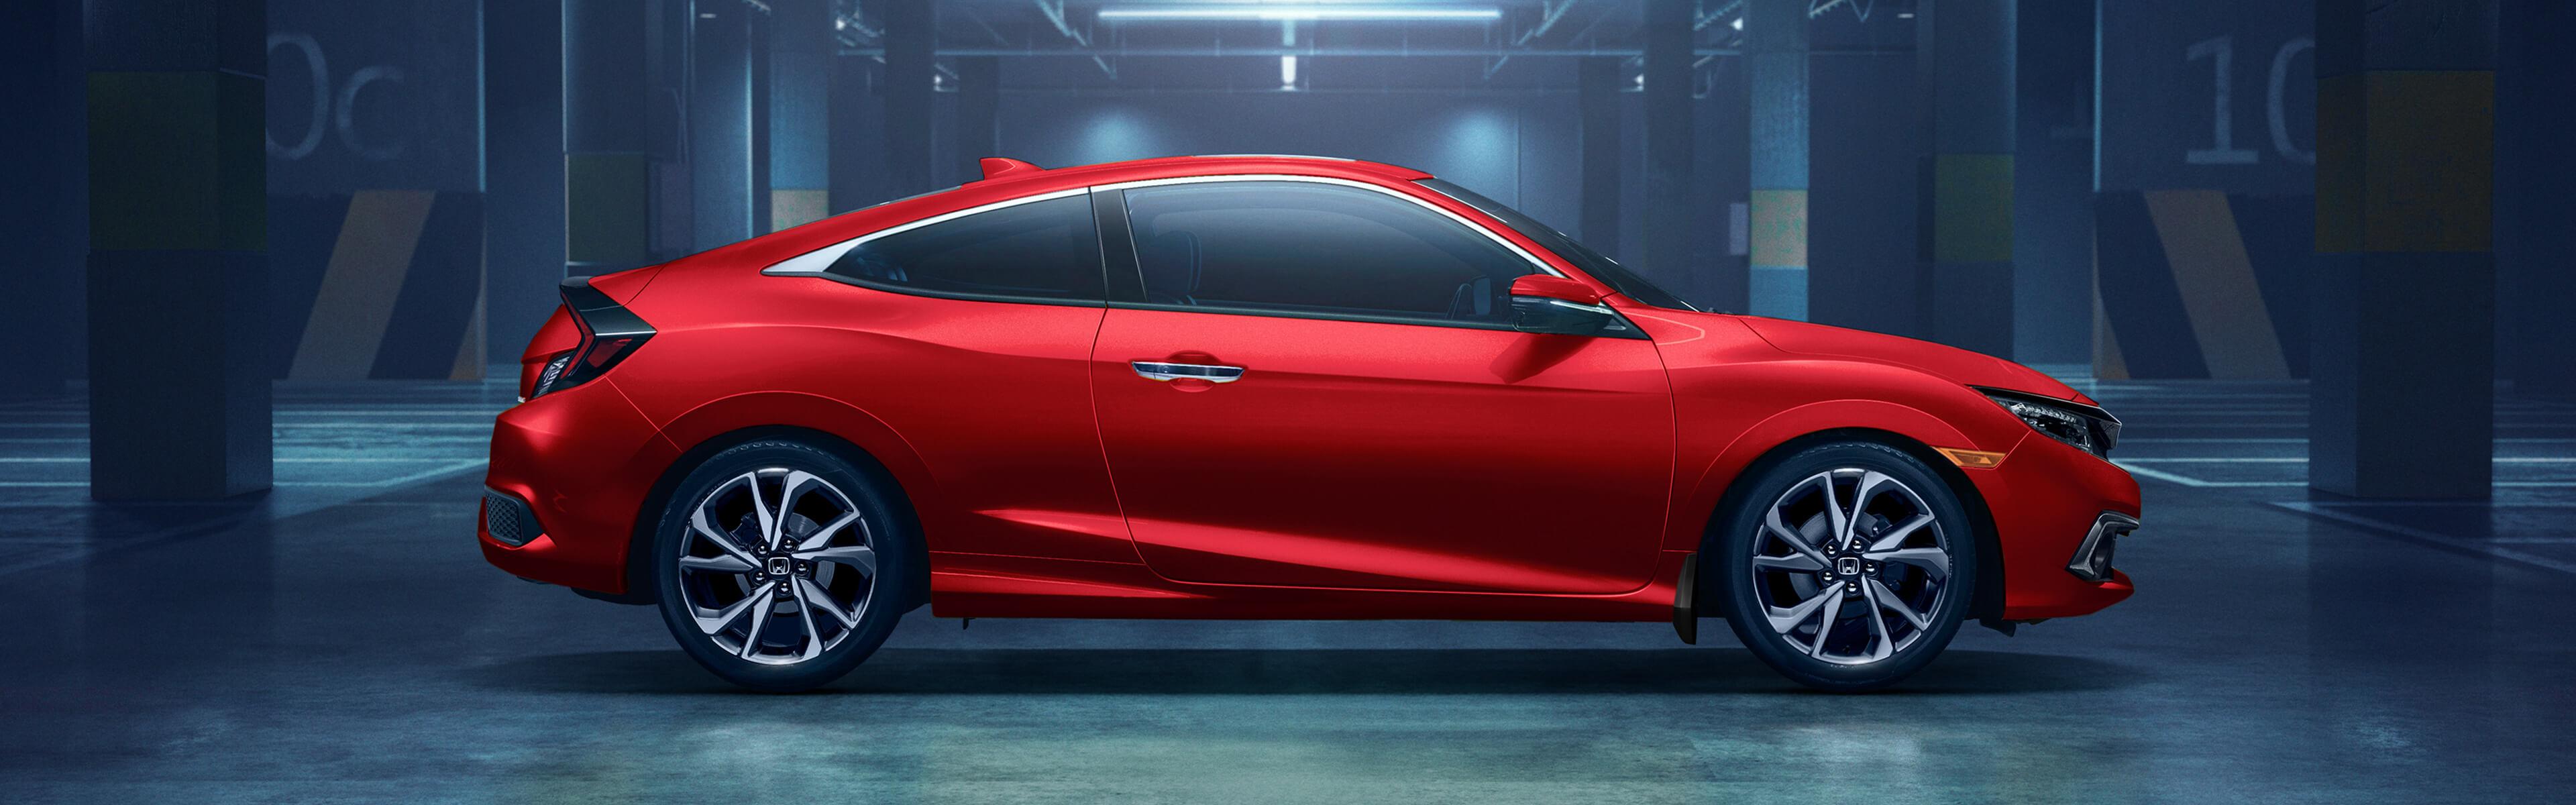 Lista Top 20 Najprodavanijih Modela Automobila U Sad Auto